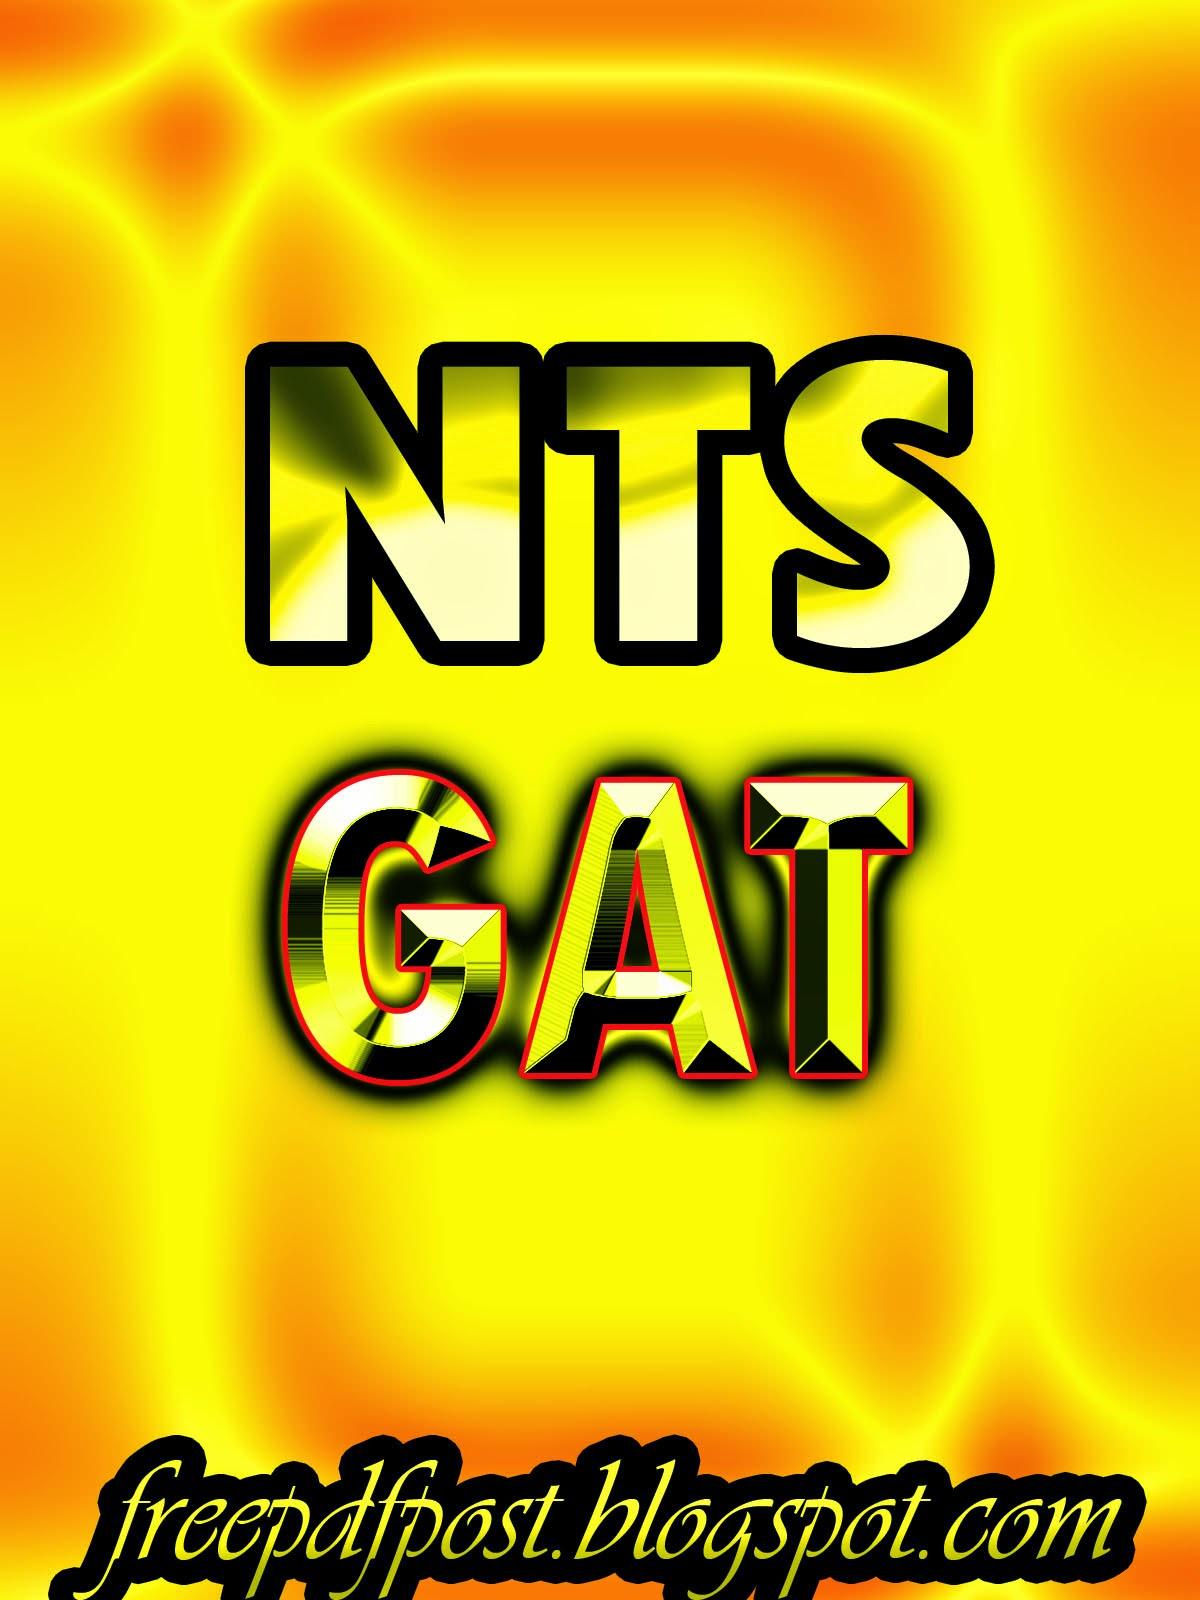 http://www.mediafire.com/view/tab1c3g49e2j4os/NTS_Book_for_GAT_General.pdf